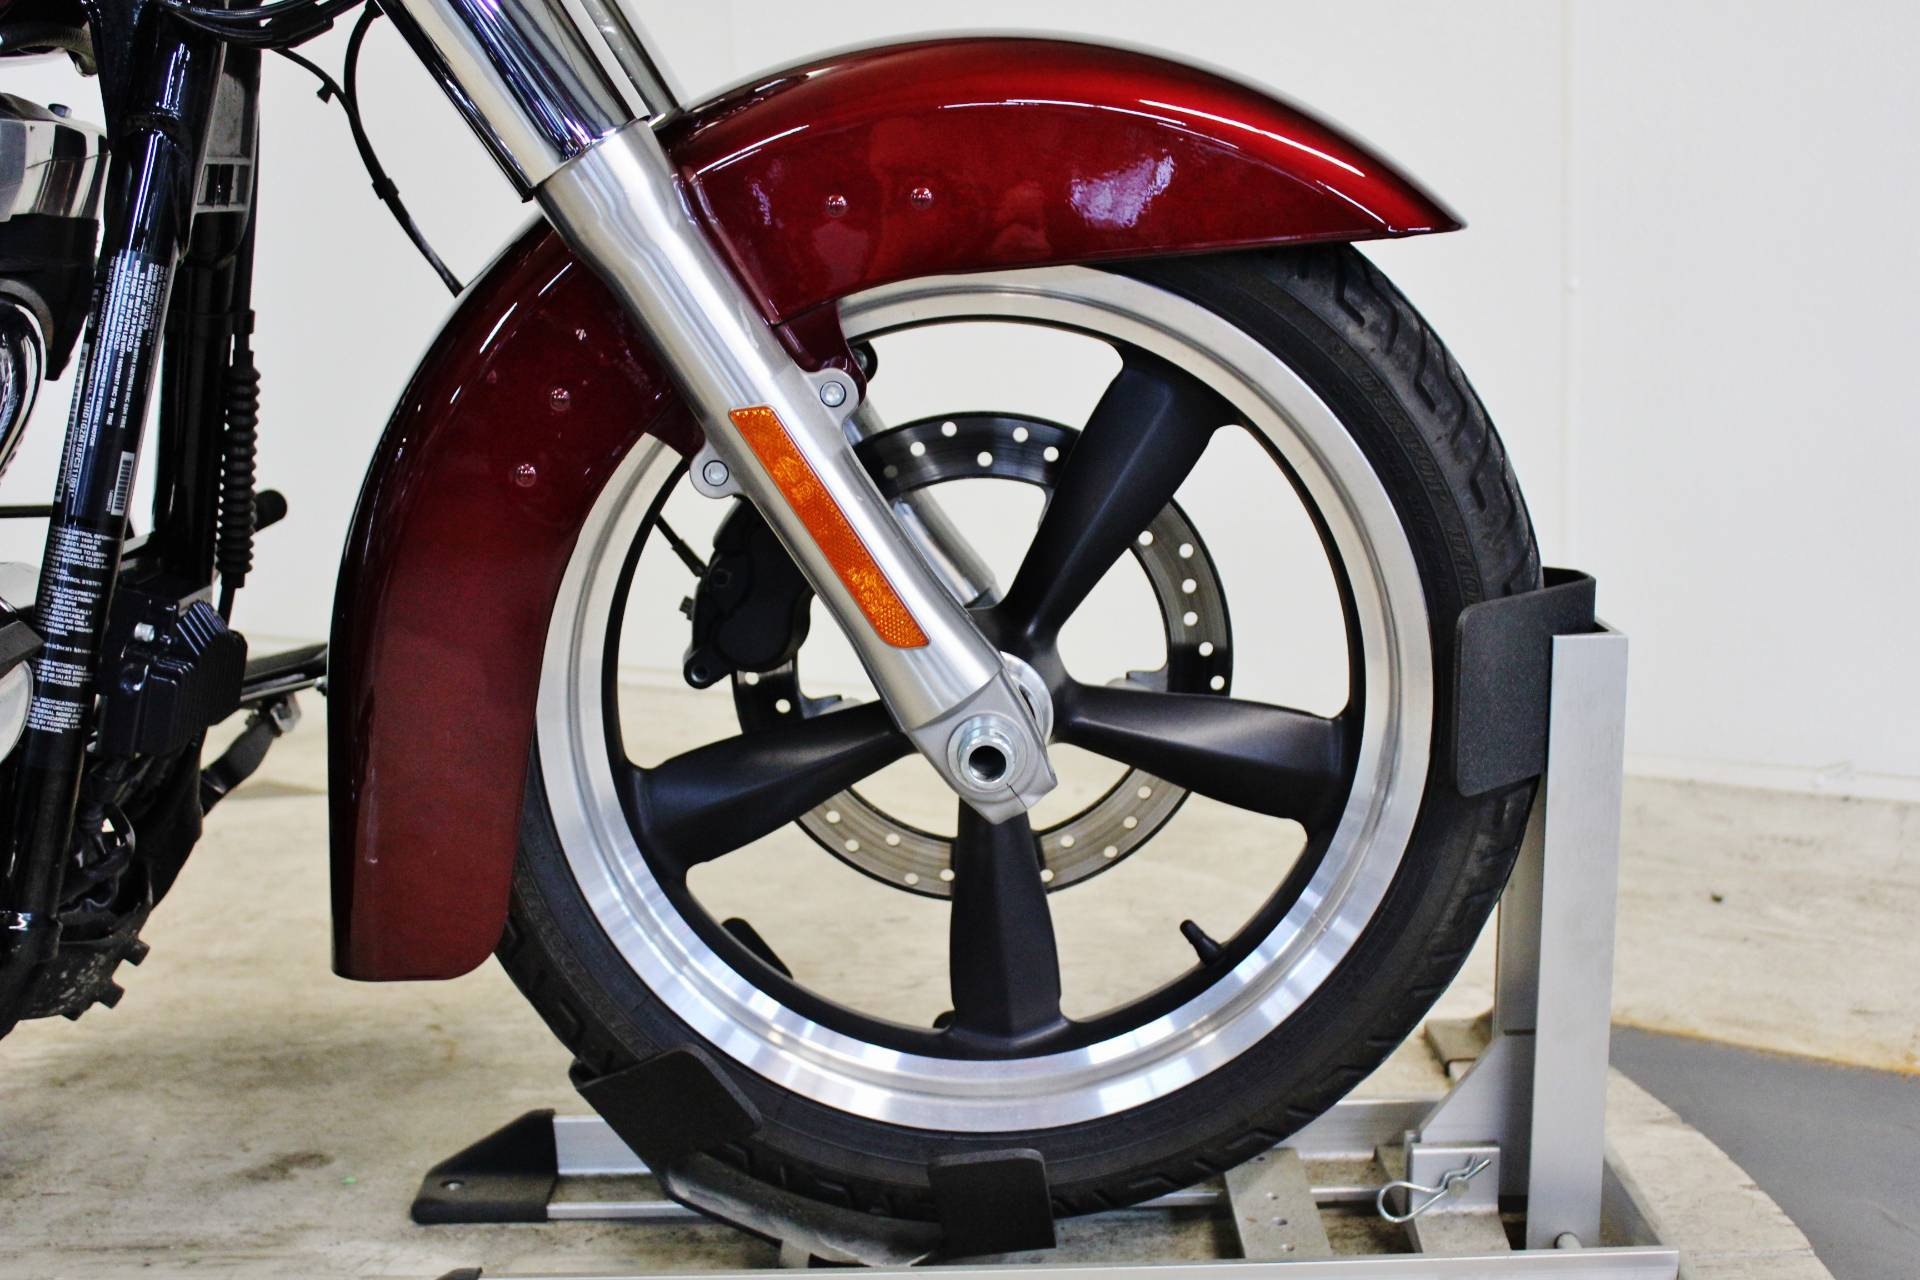 2015 Harley-Davidson Switchback™ in Pittsfield, Massachusetts